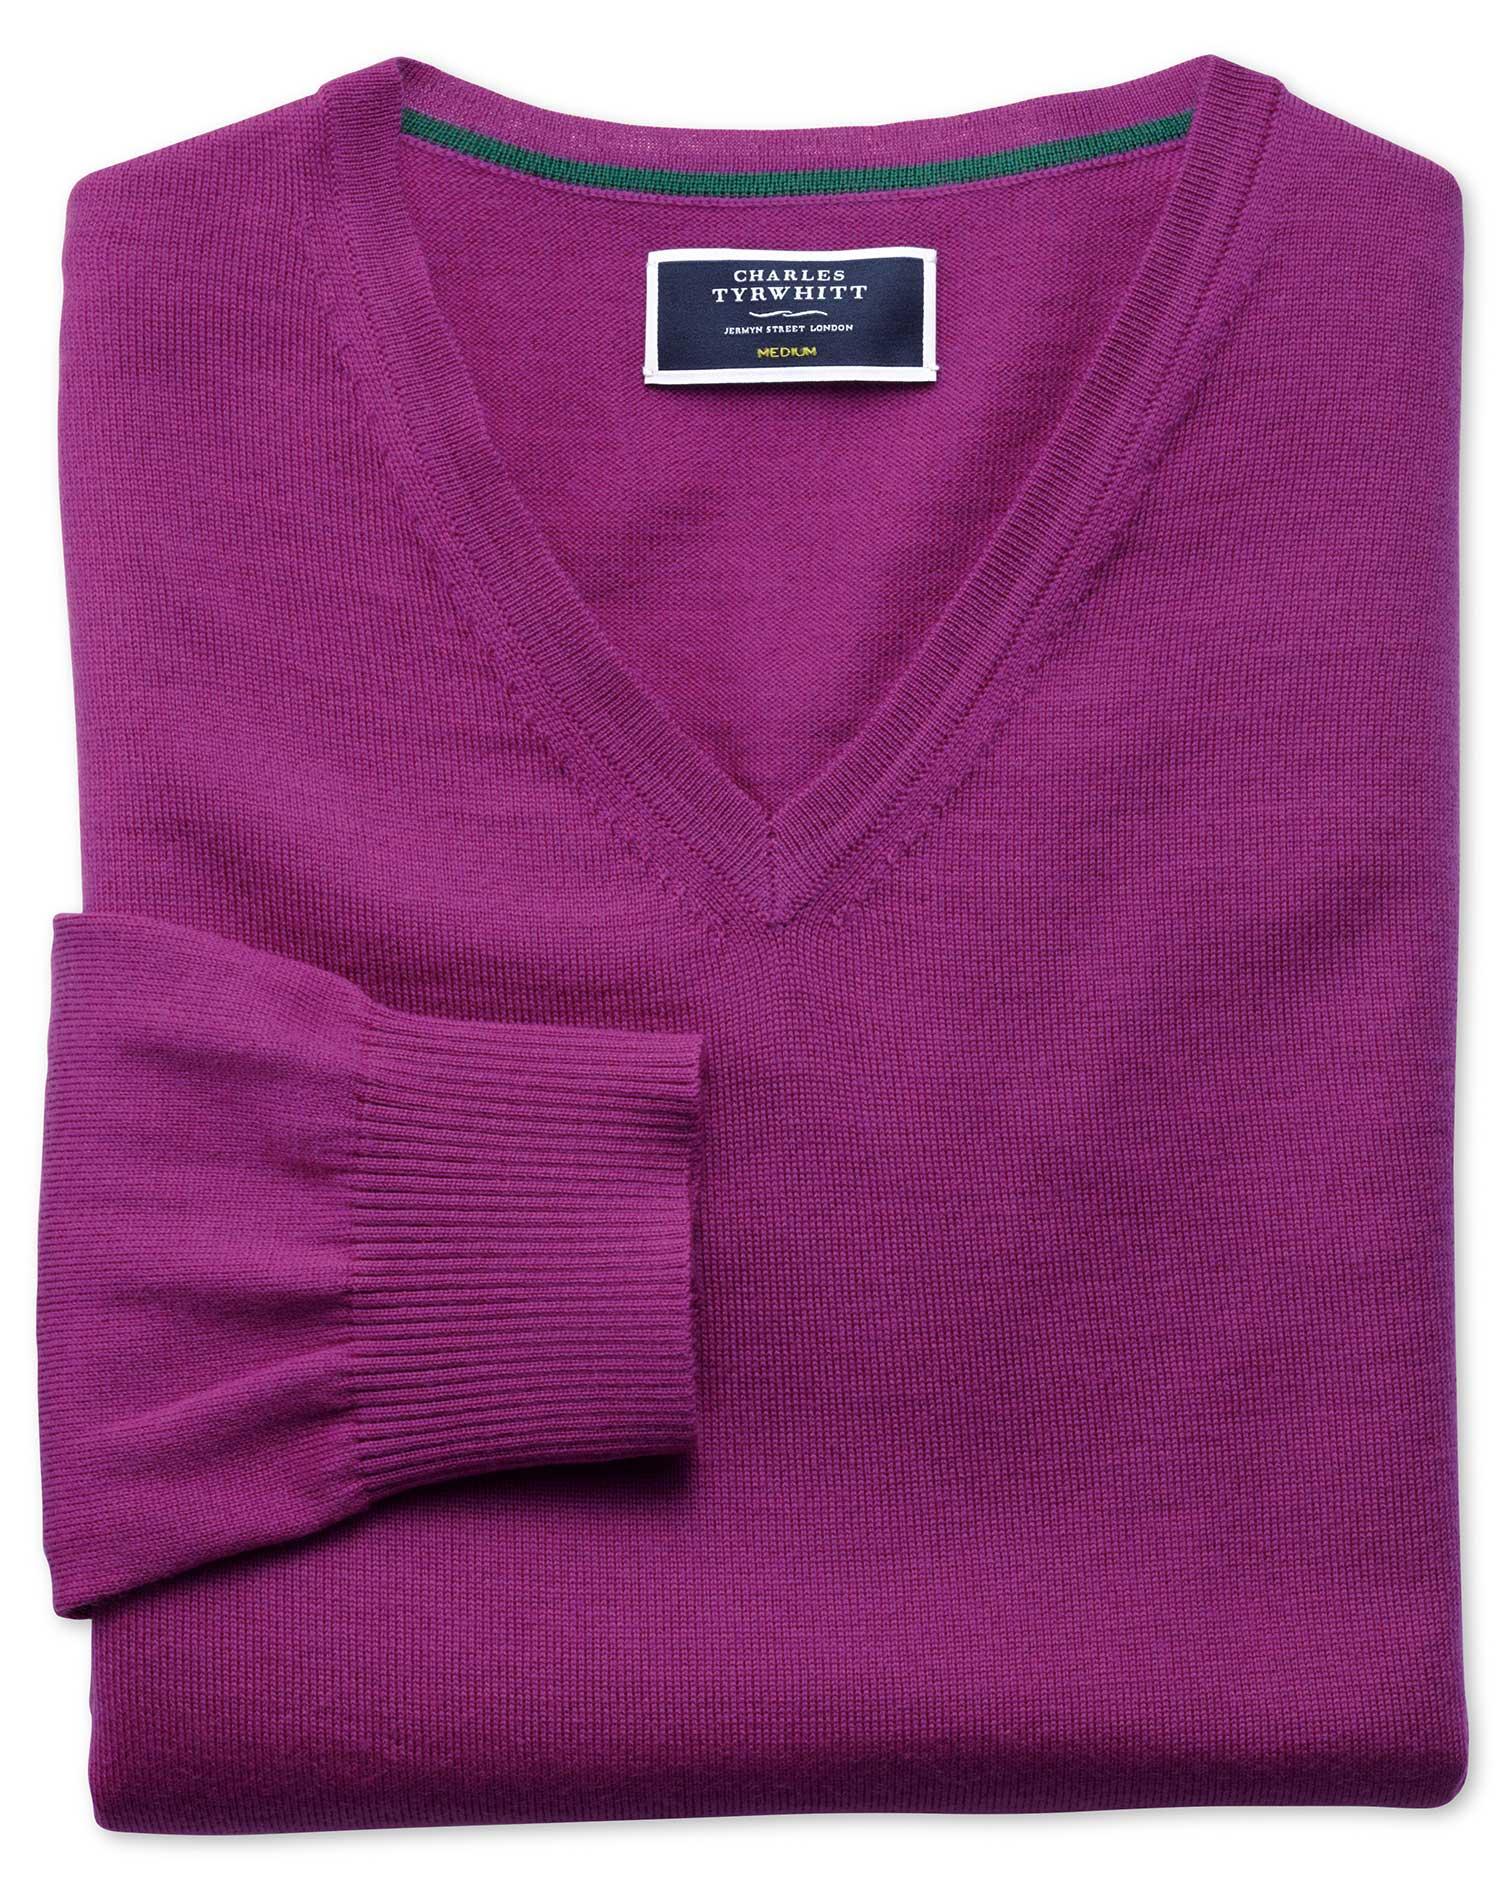 Berry Merino Wool V-Neck Jumper Size Small by Charles Tyrwhitt